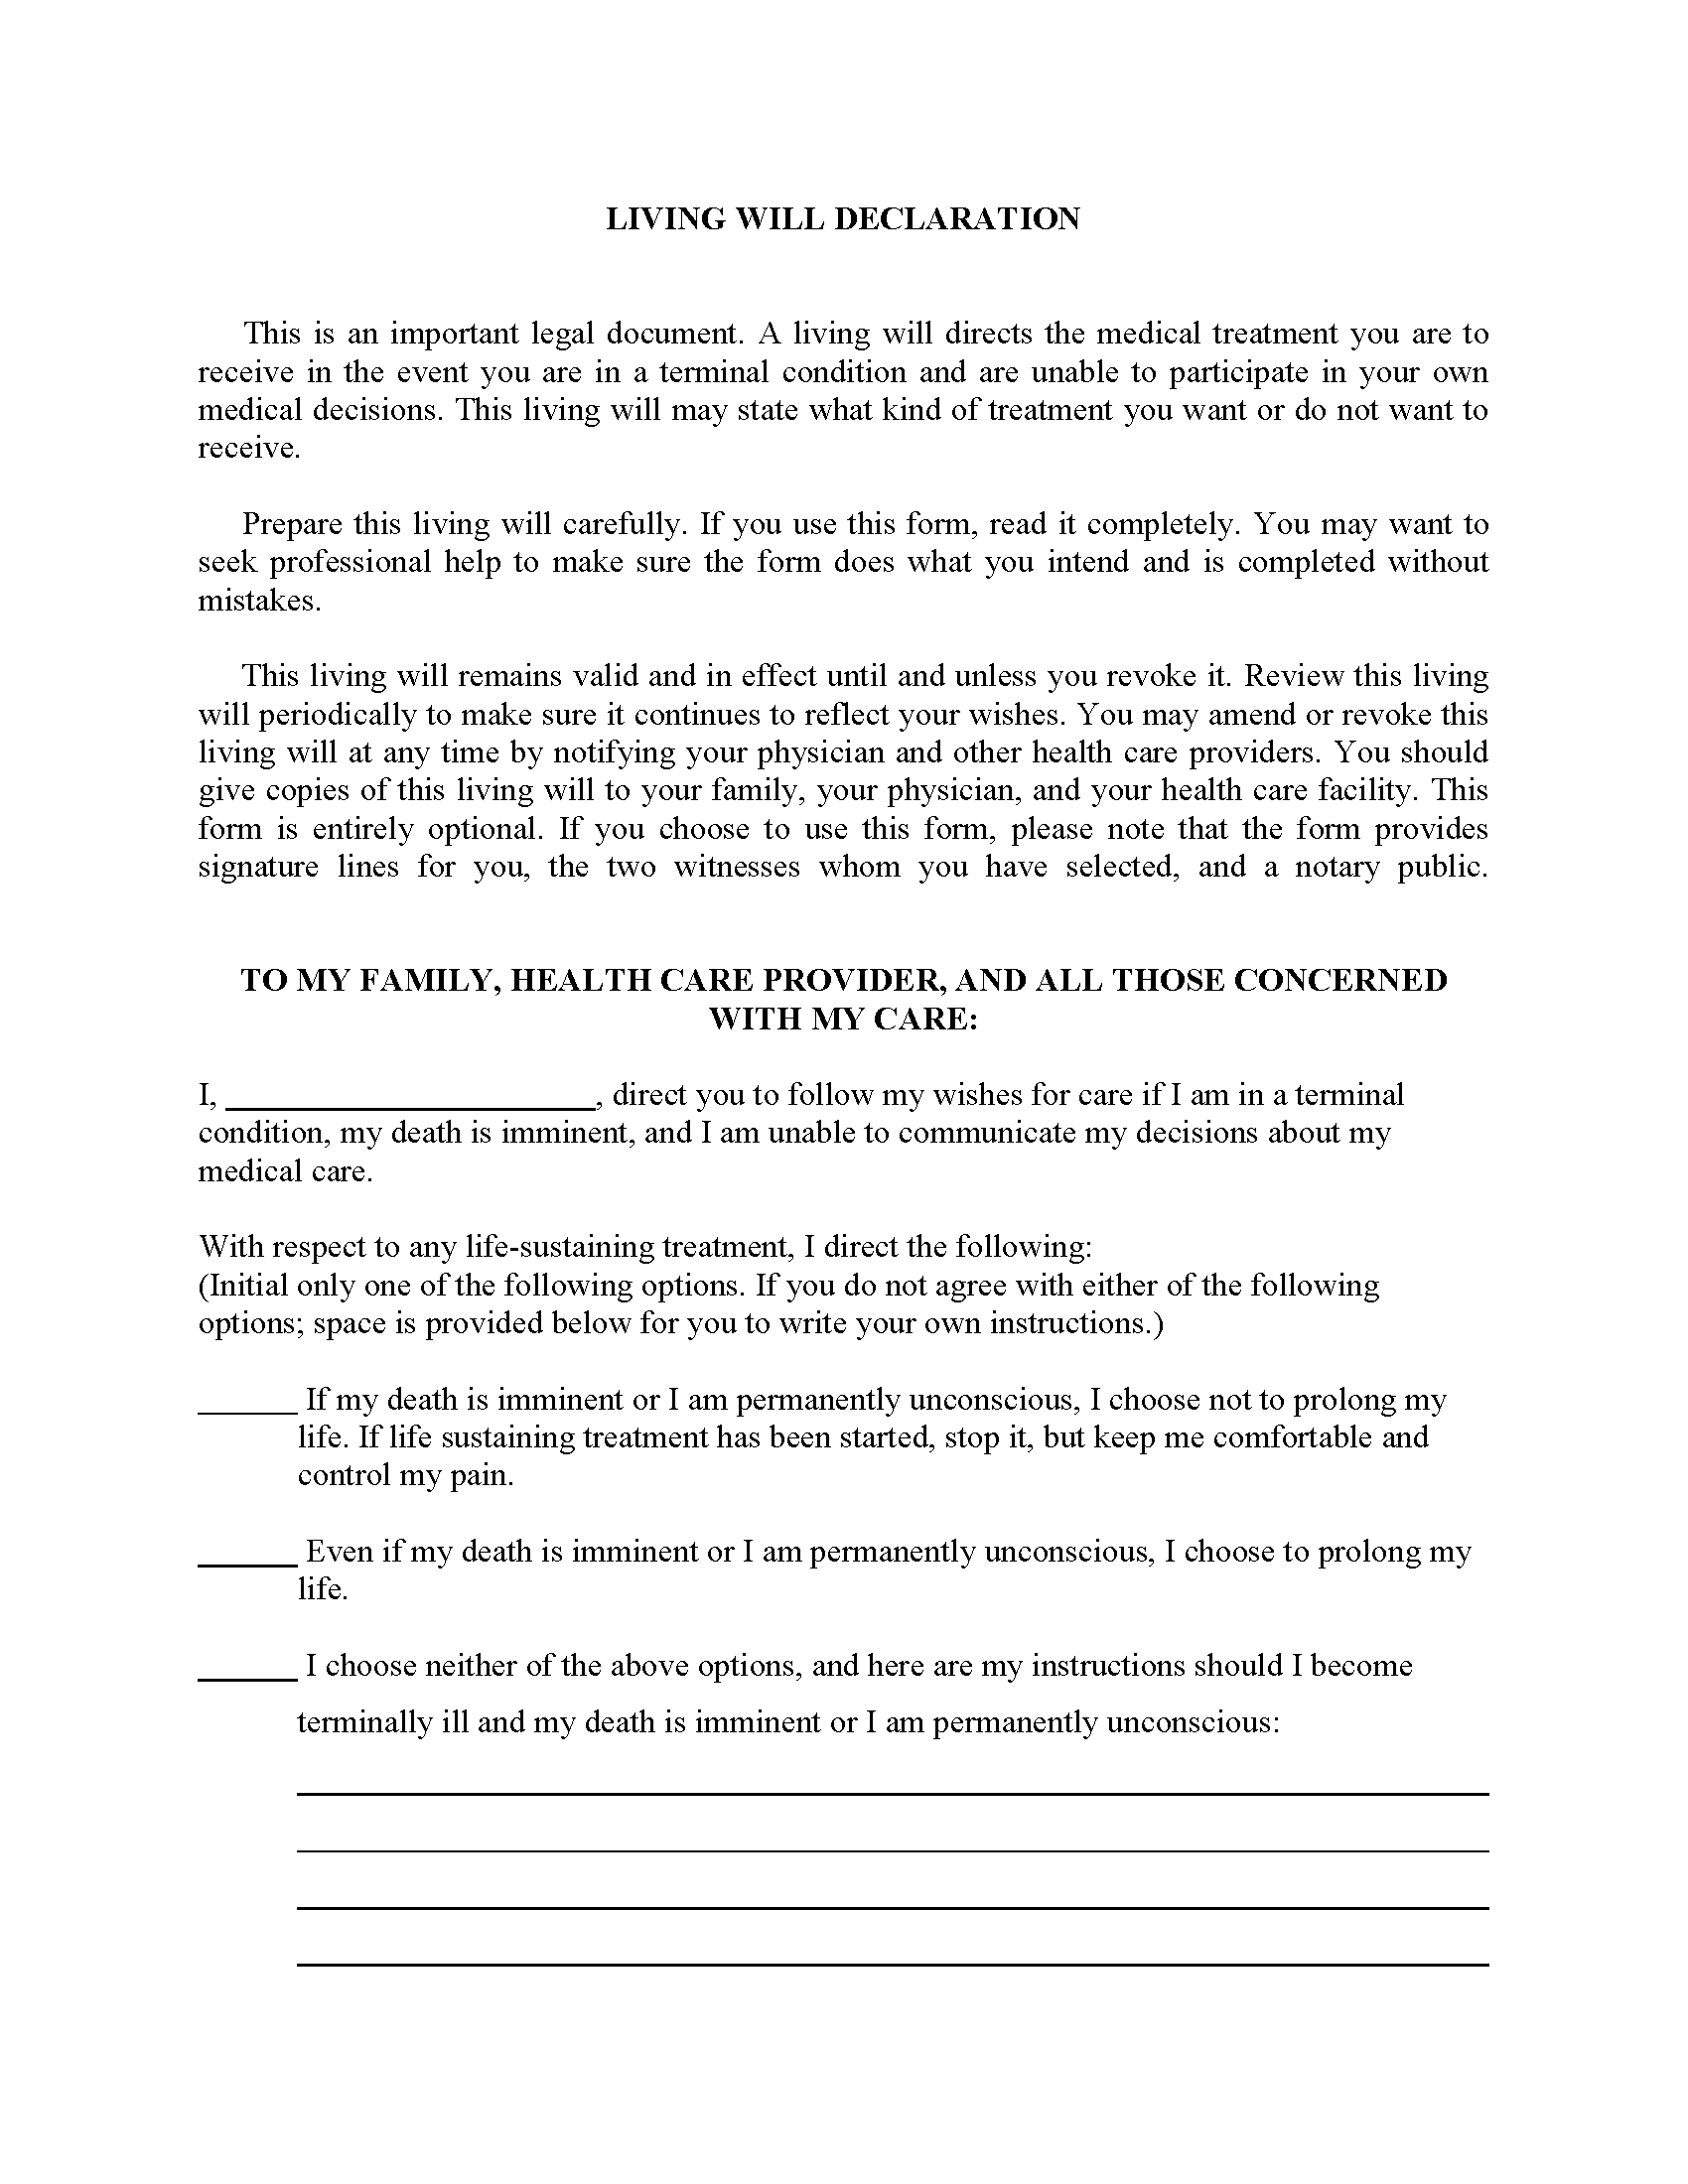 South Dakota Advance Directive For Health Care